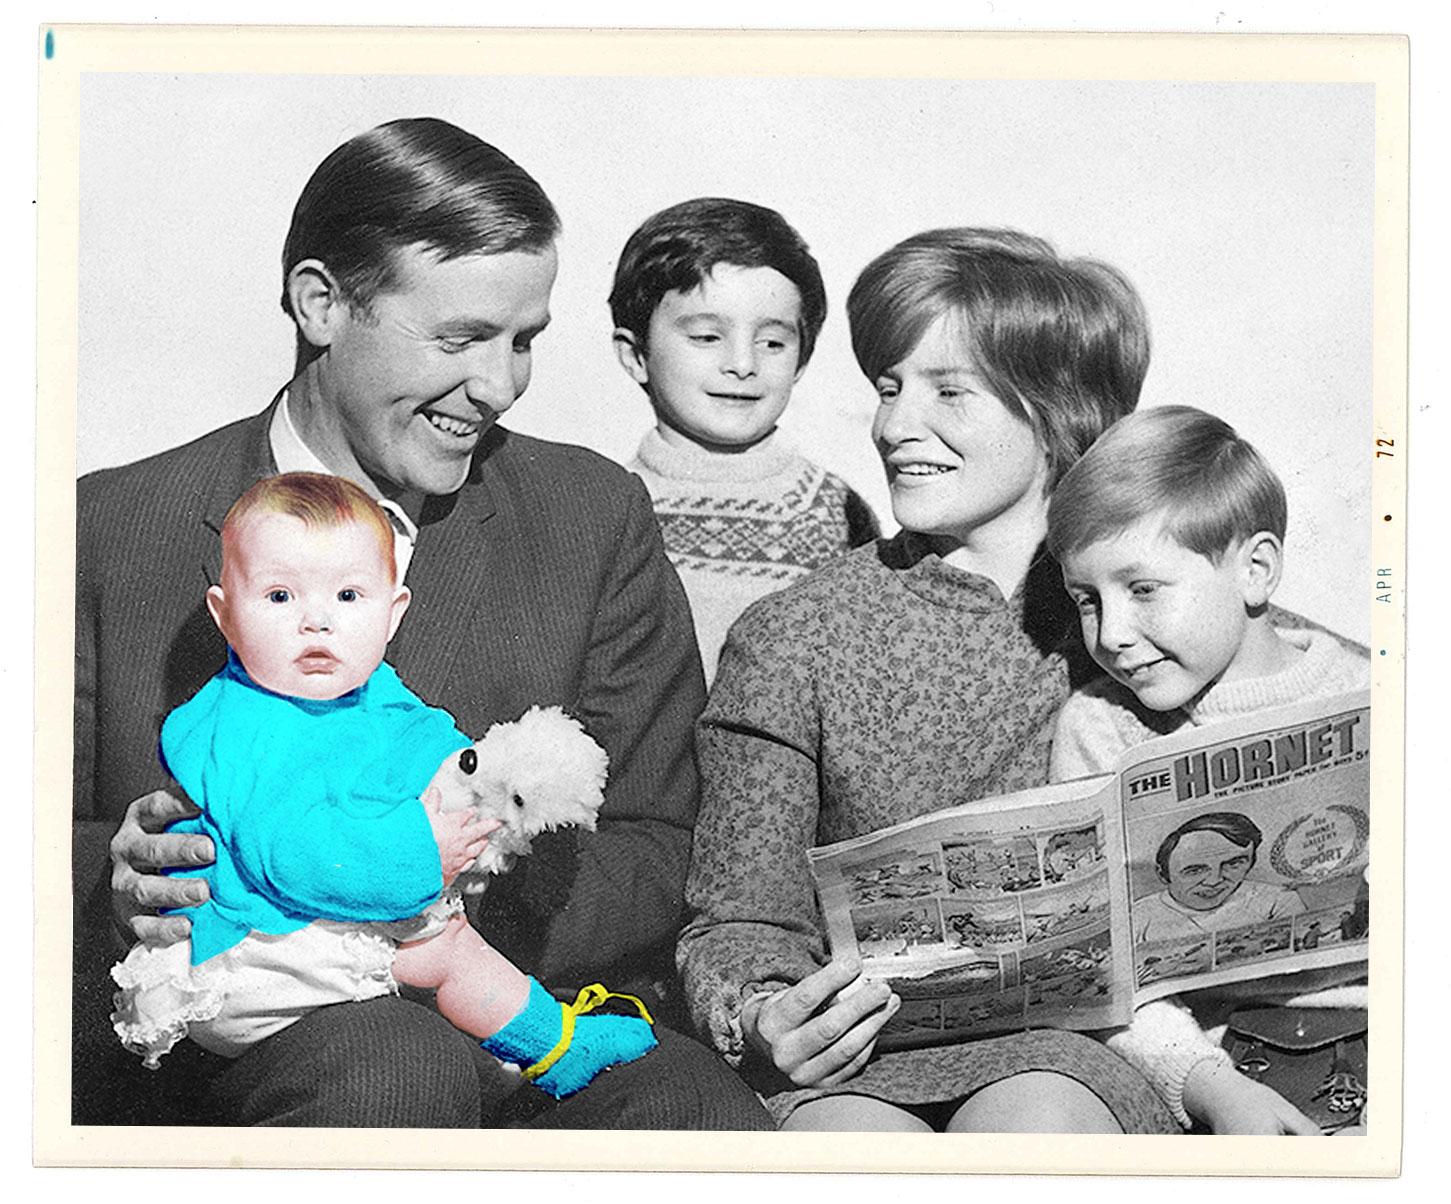 Miranda Doyle (the baby) and her family